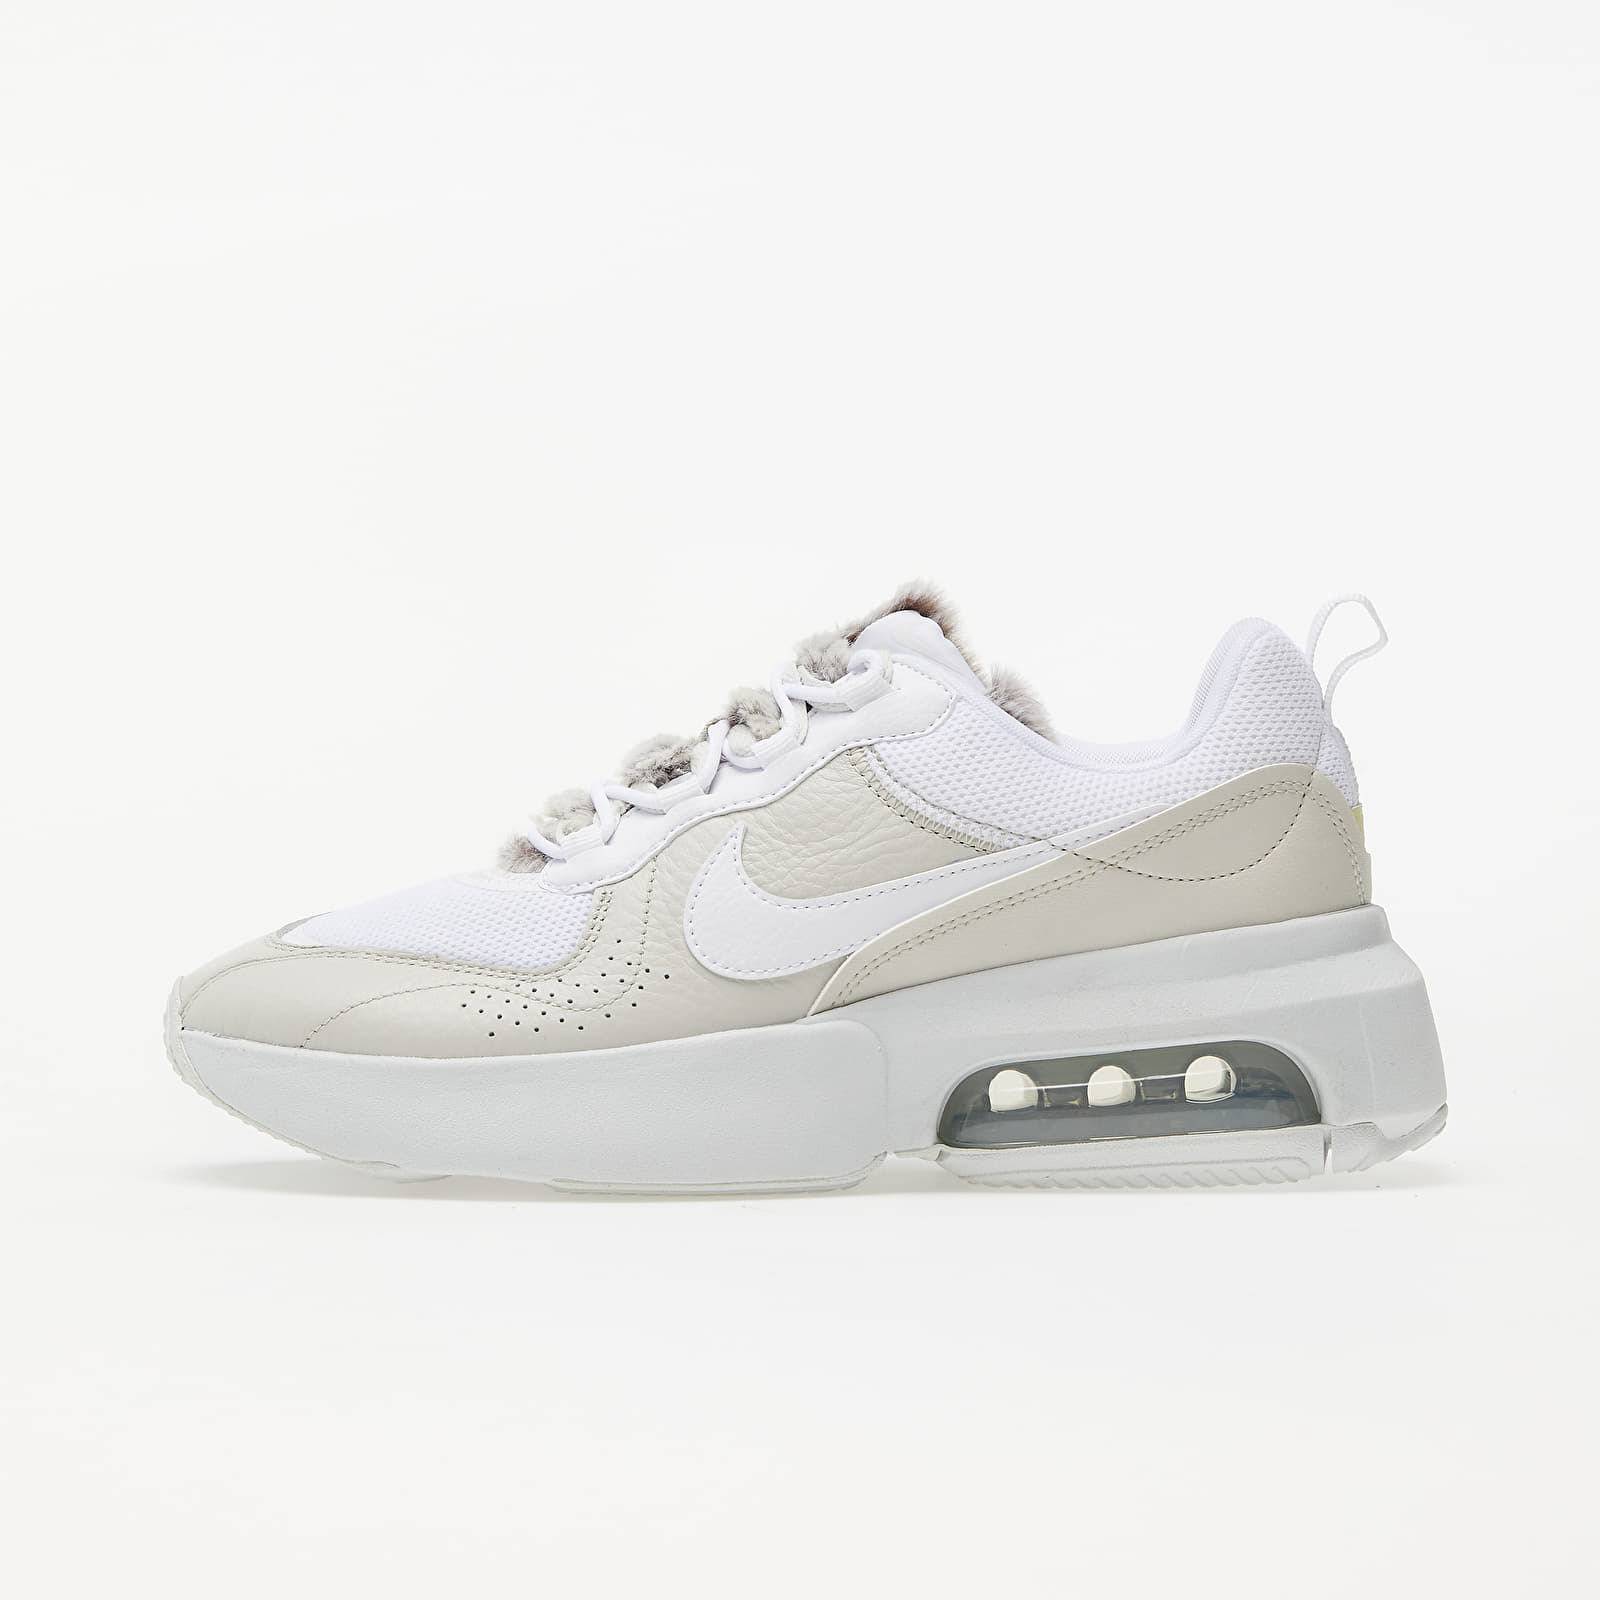 Scarpe e sneaker da donna Nike Wmns Air Max Verona Light Bone/ White-Photon Dust-Life Lime